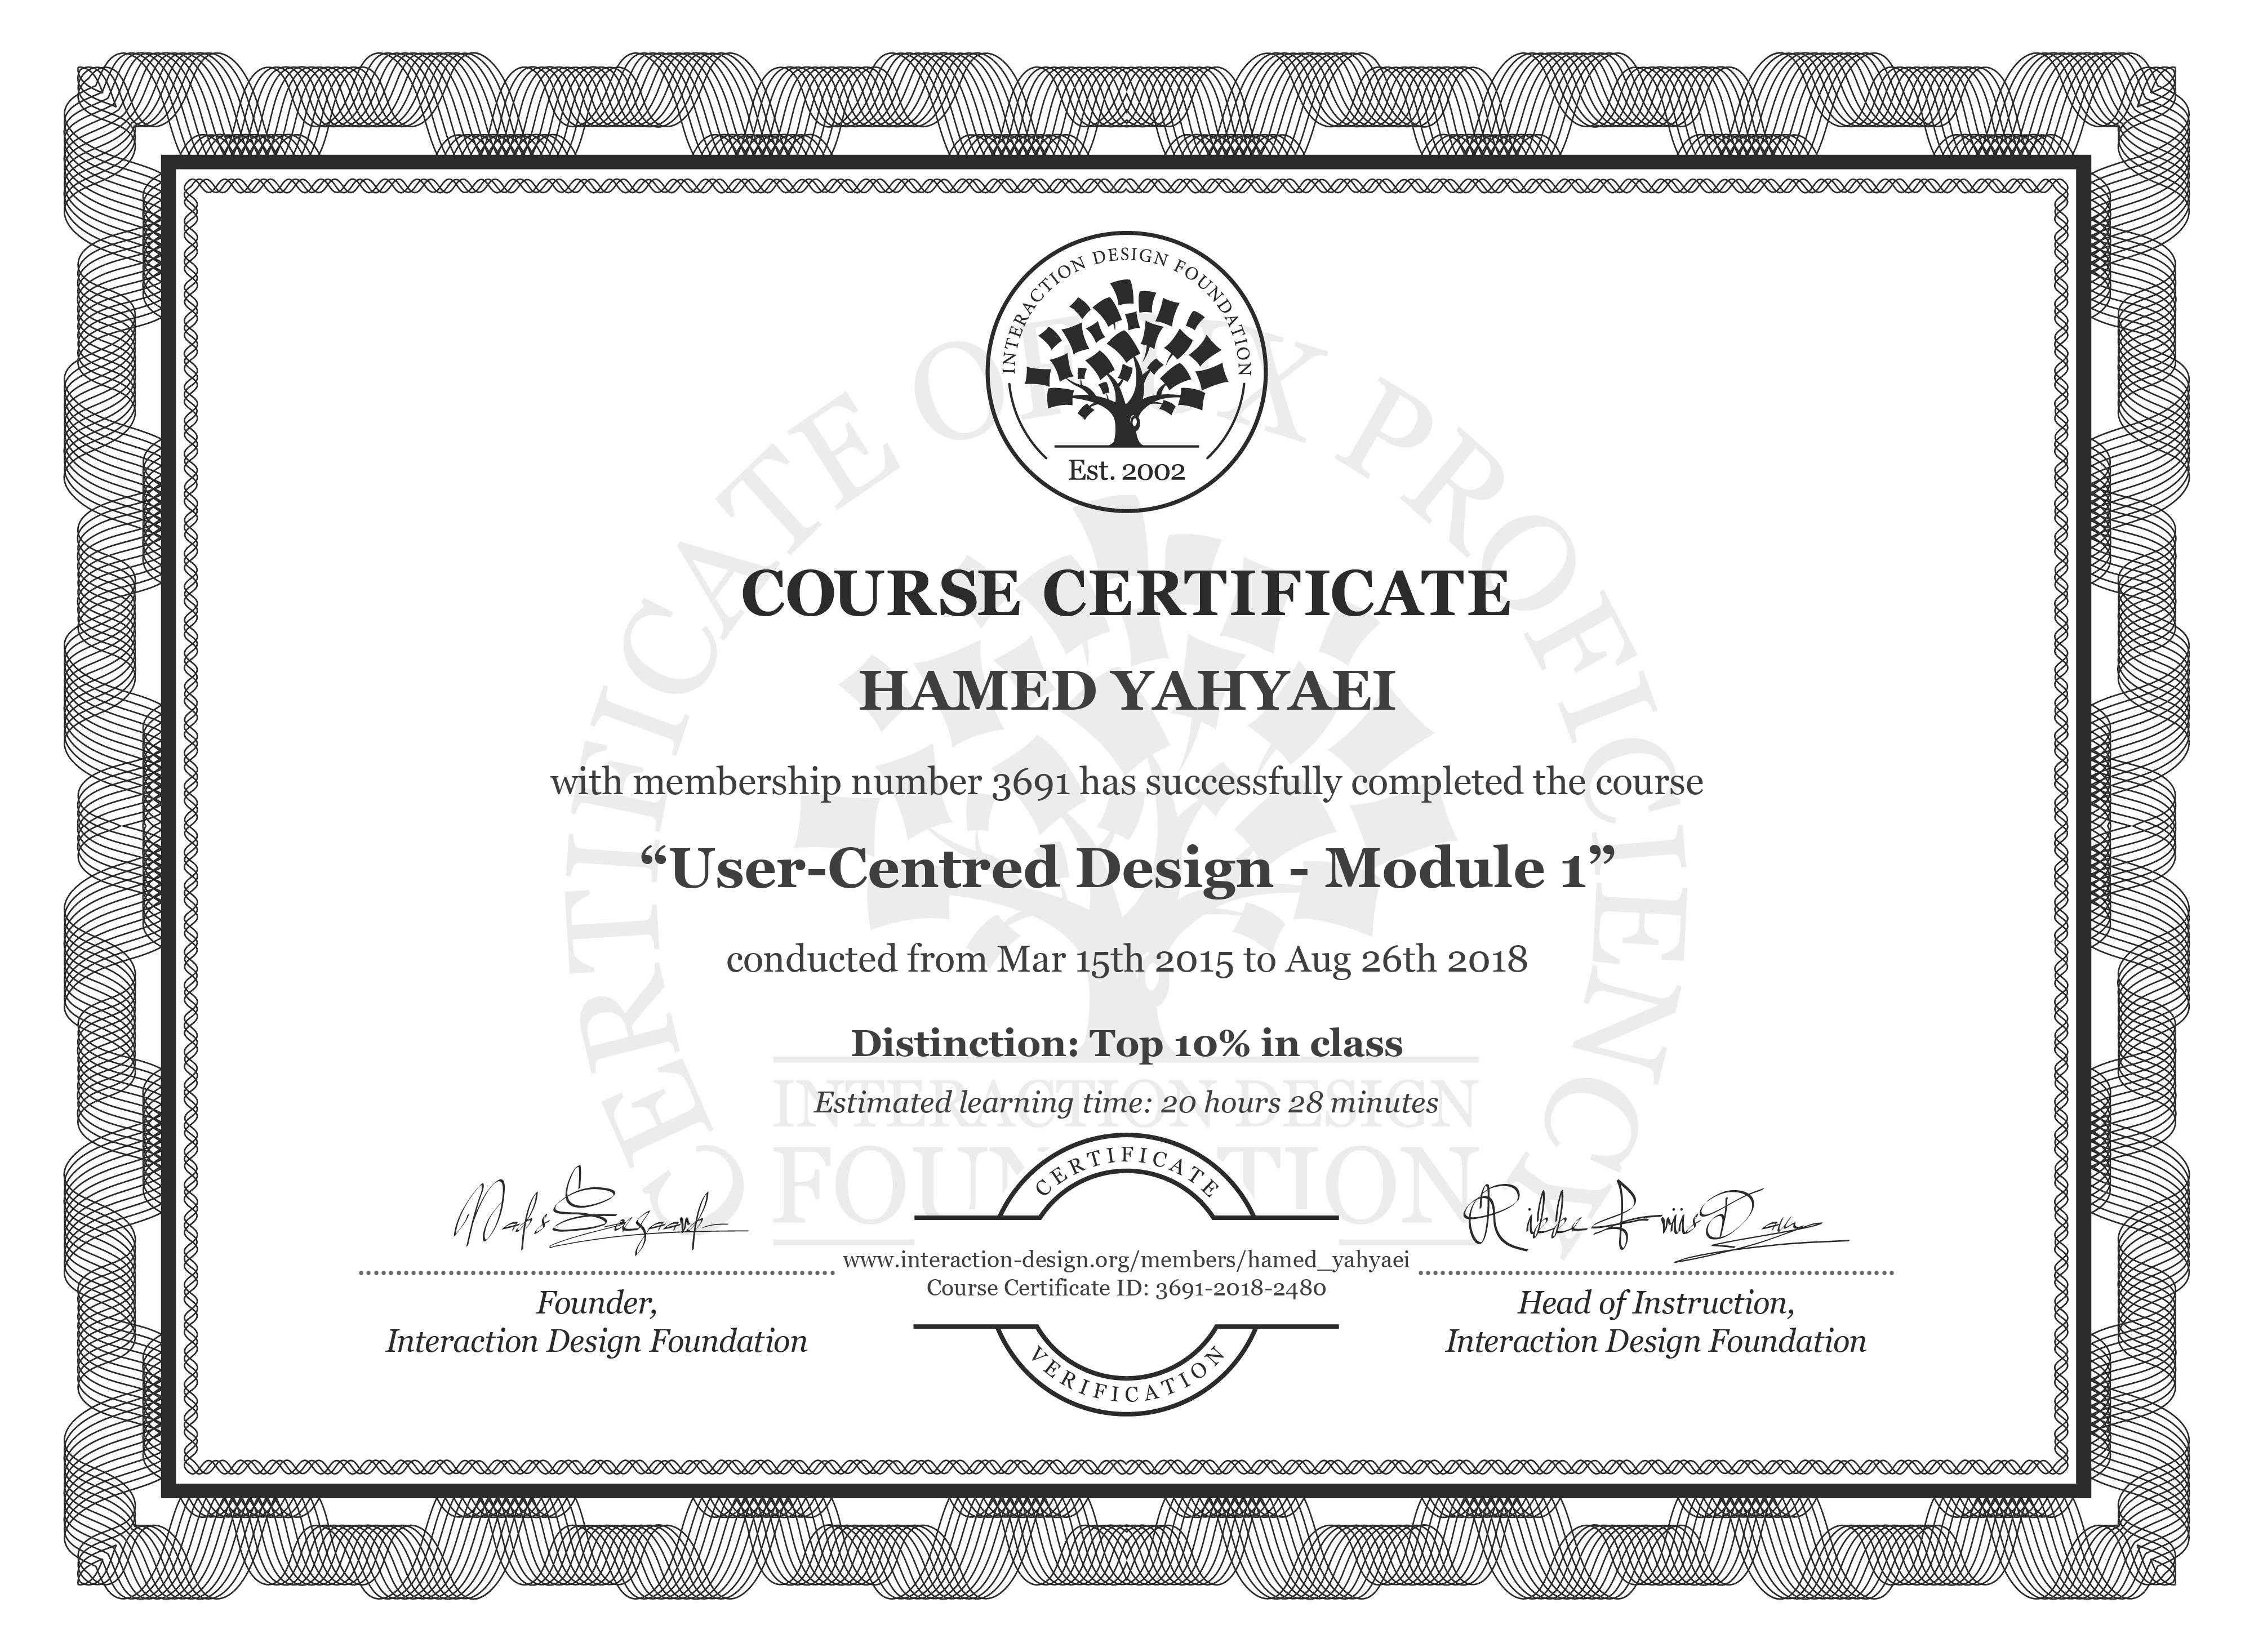 HAMED YAHYAEI's Course Certificate: User-Centred Design - Module 1